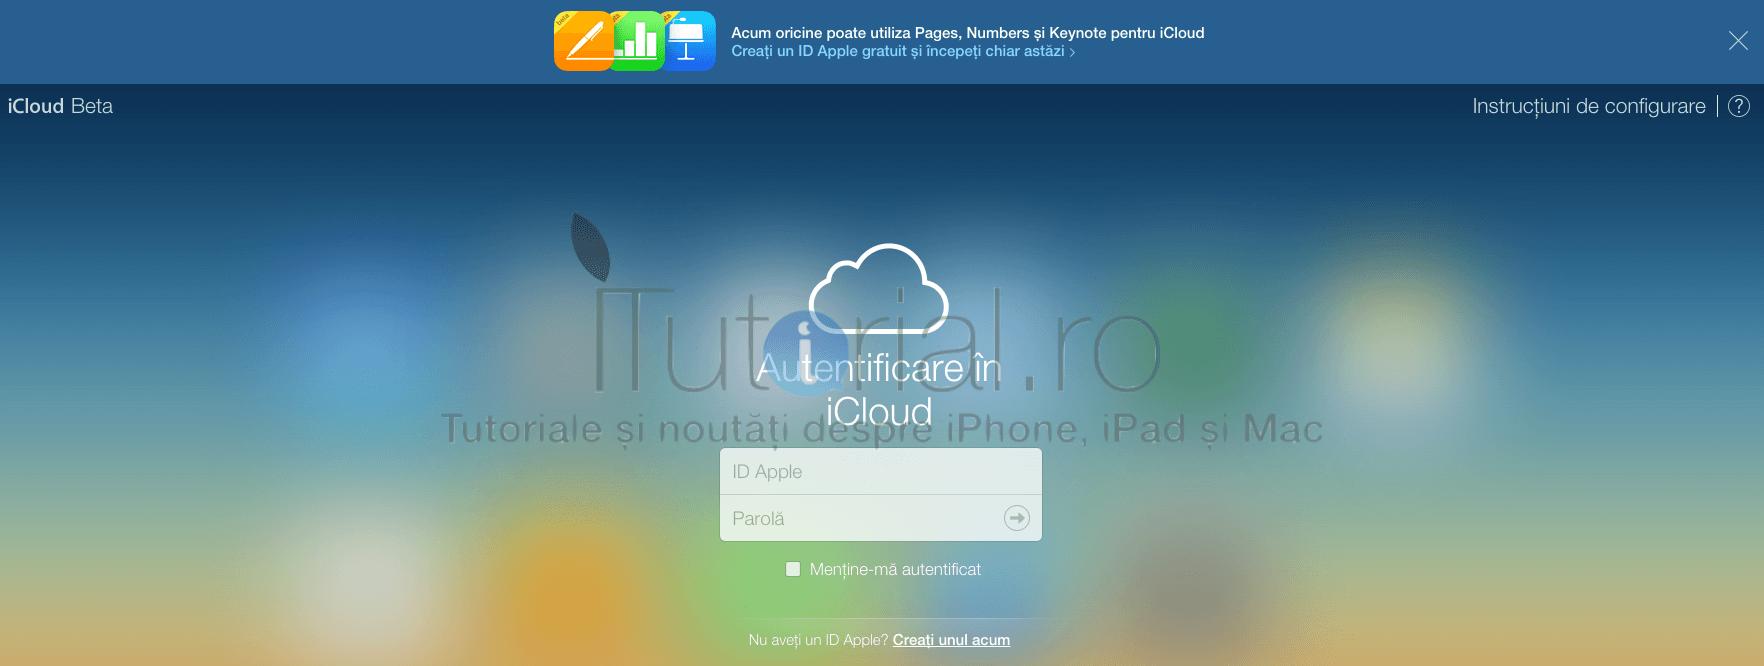 apple icloud.com beta